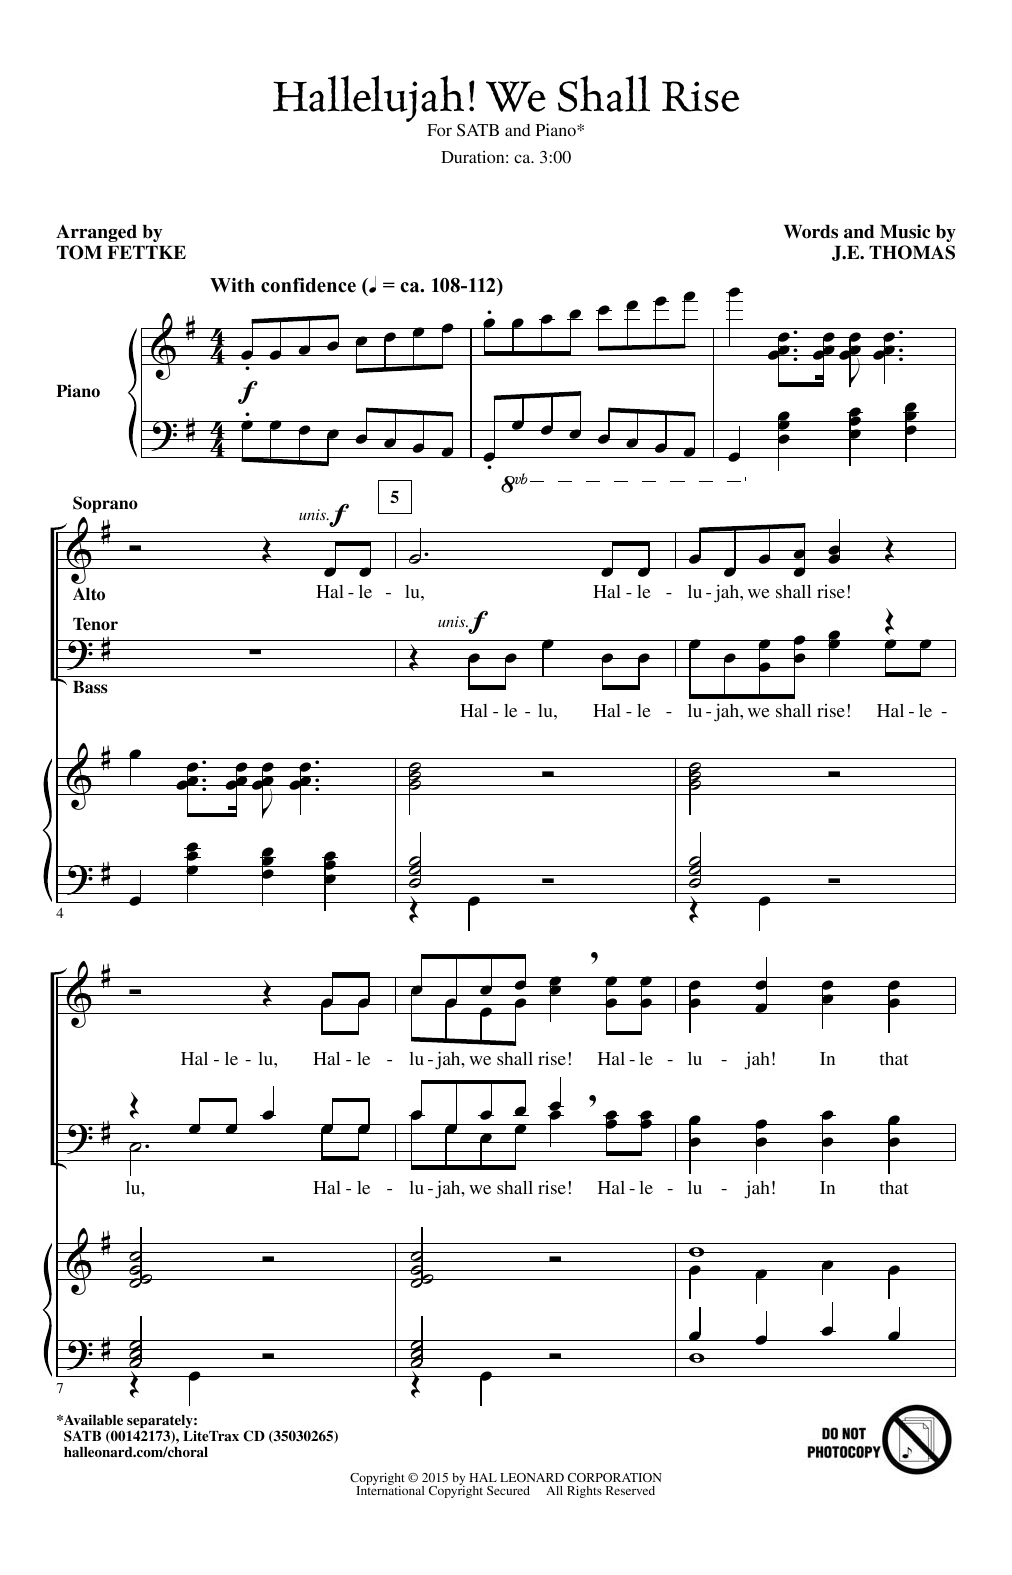 Hallelujah! We Shall Rise Sheet Music